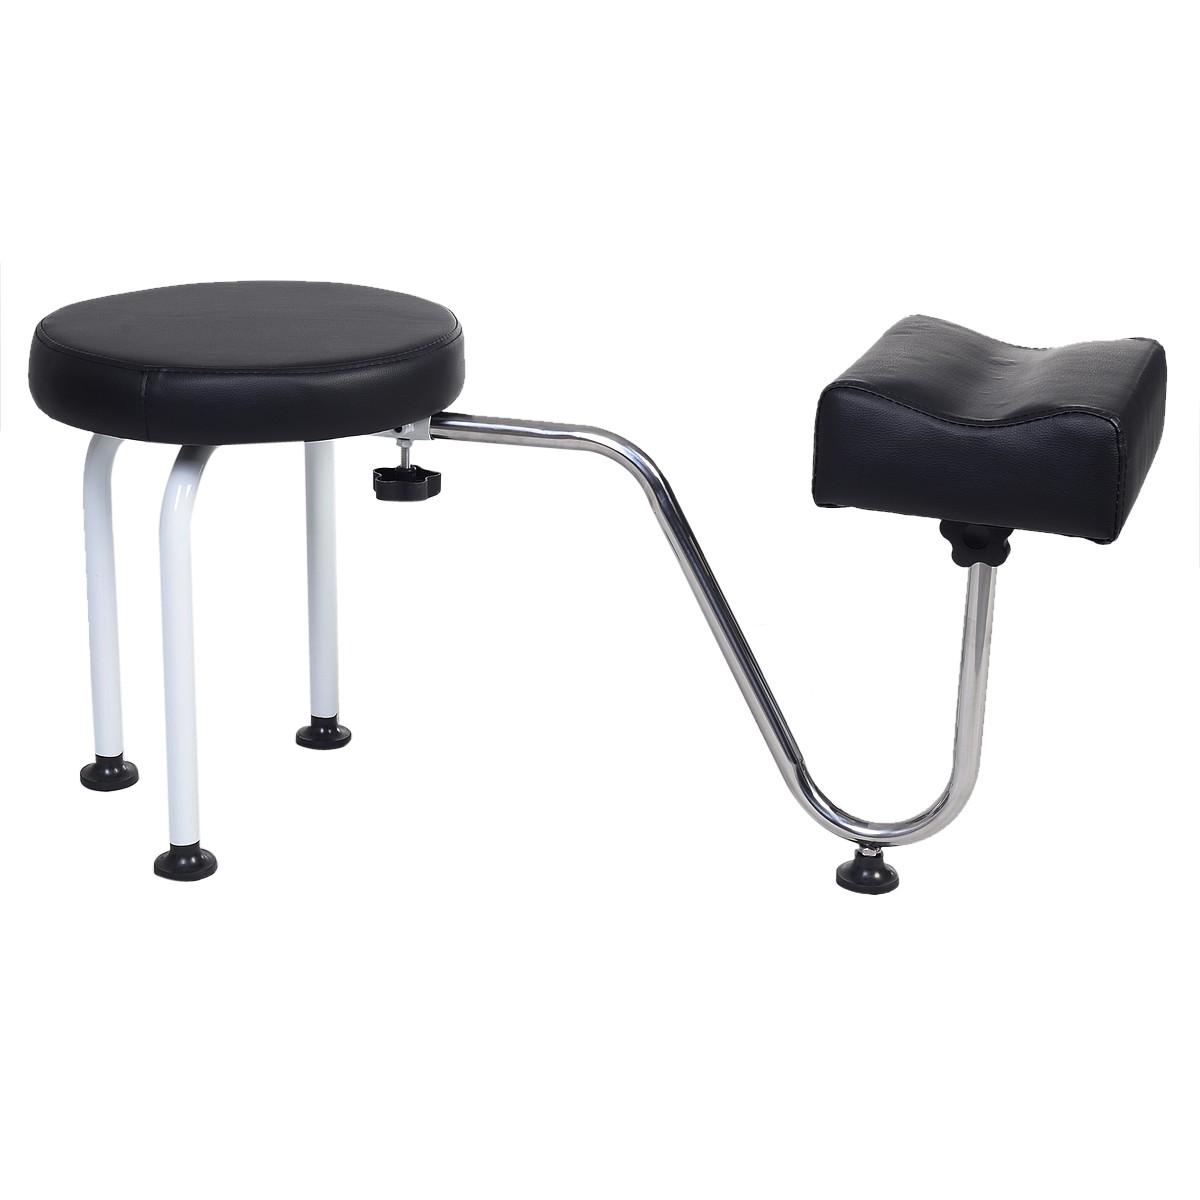 Chair nail salon furniture ak 01 g buy manicure chair nail salon - Does Not Apply